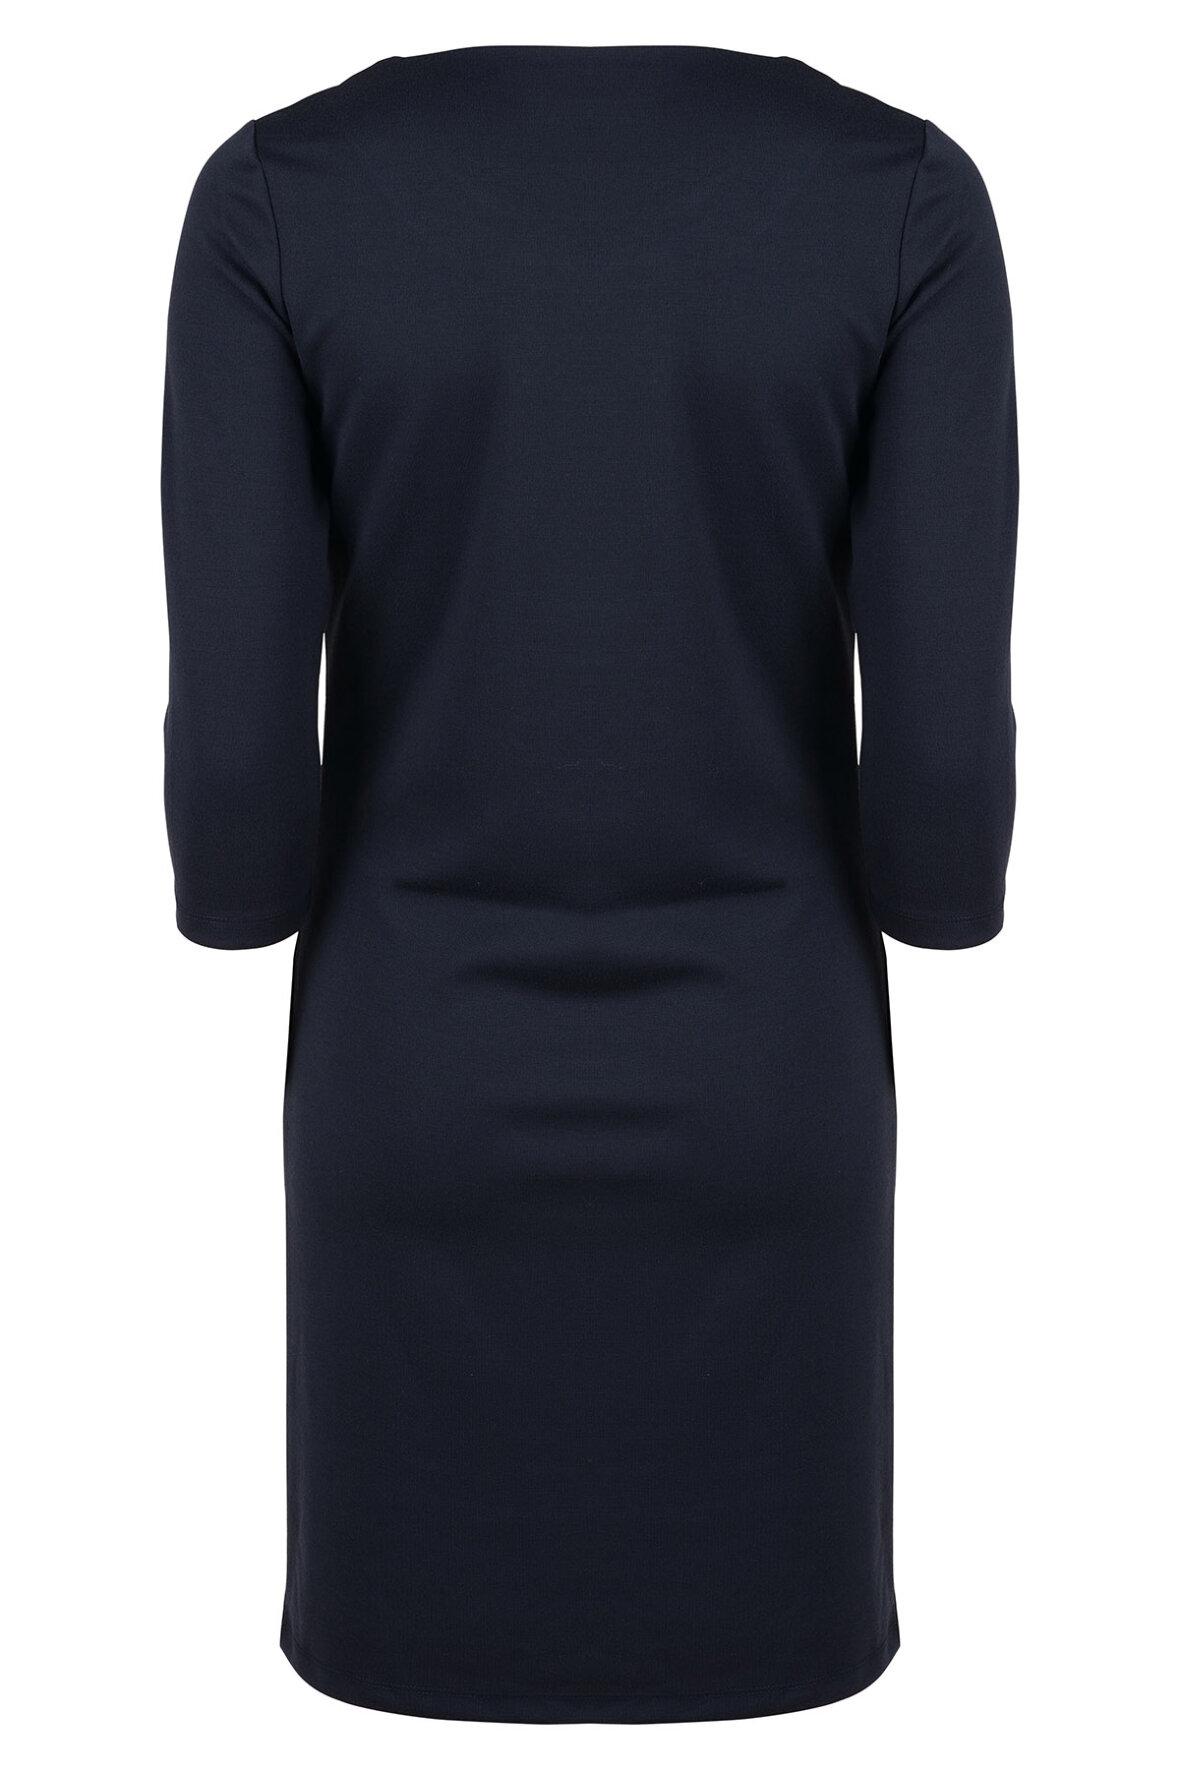 c150b8b4 Soya Concept Dena Solid Dress basis kjole til små penge - Hos Lohse